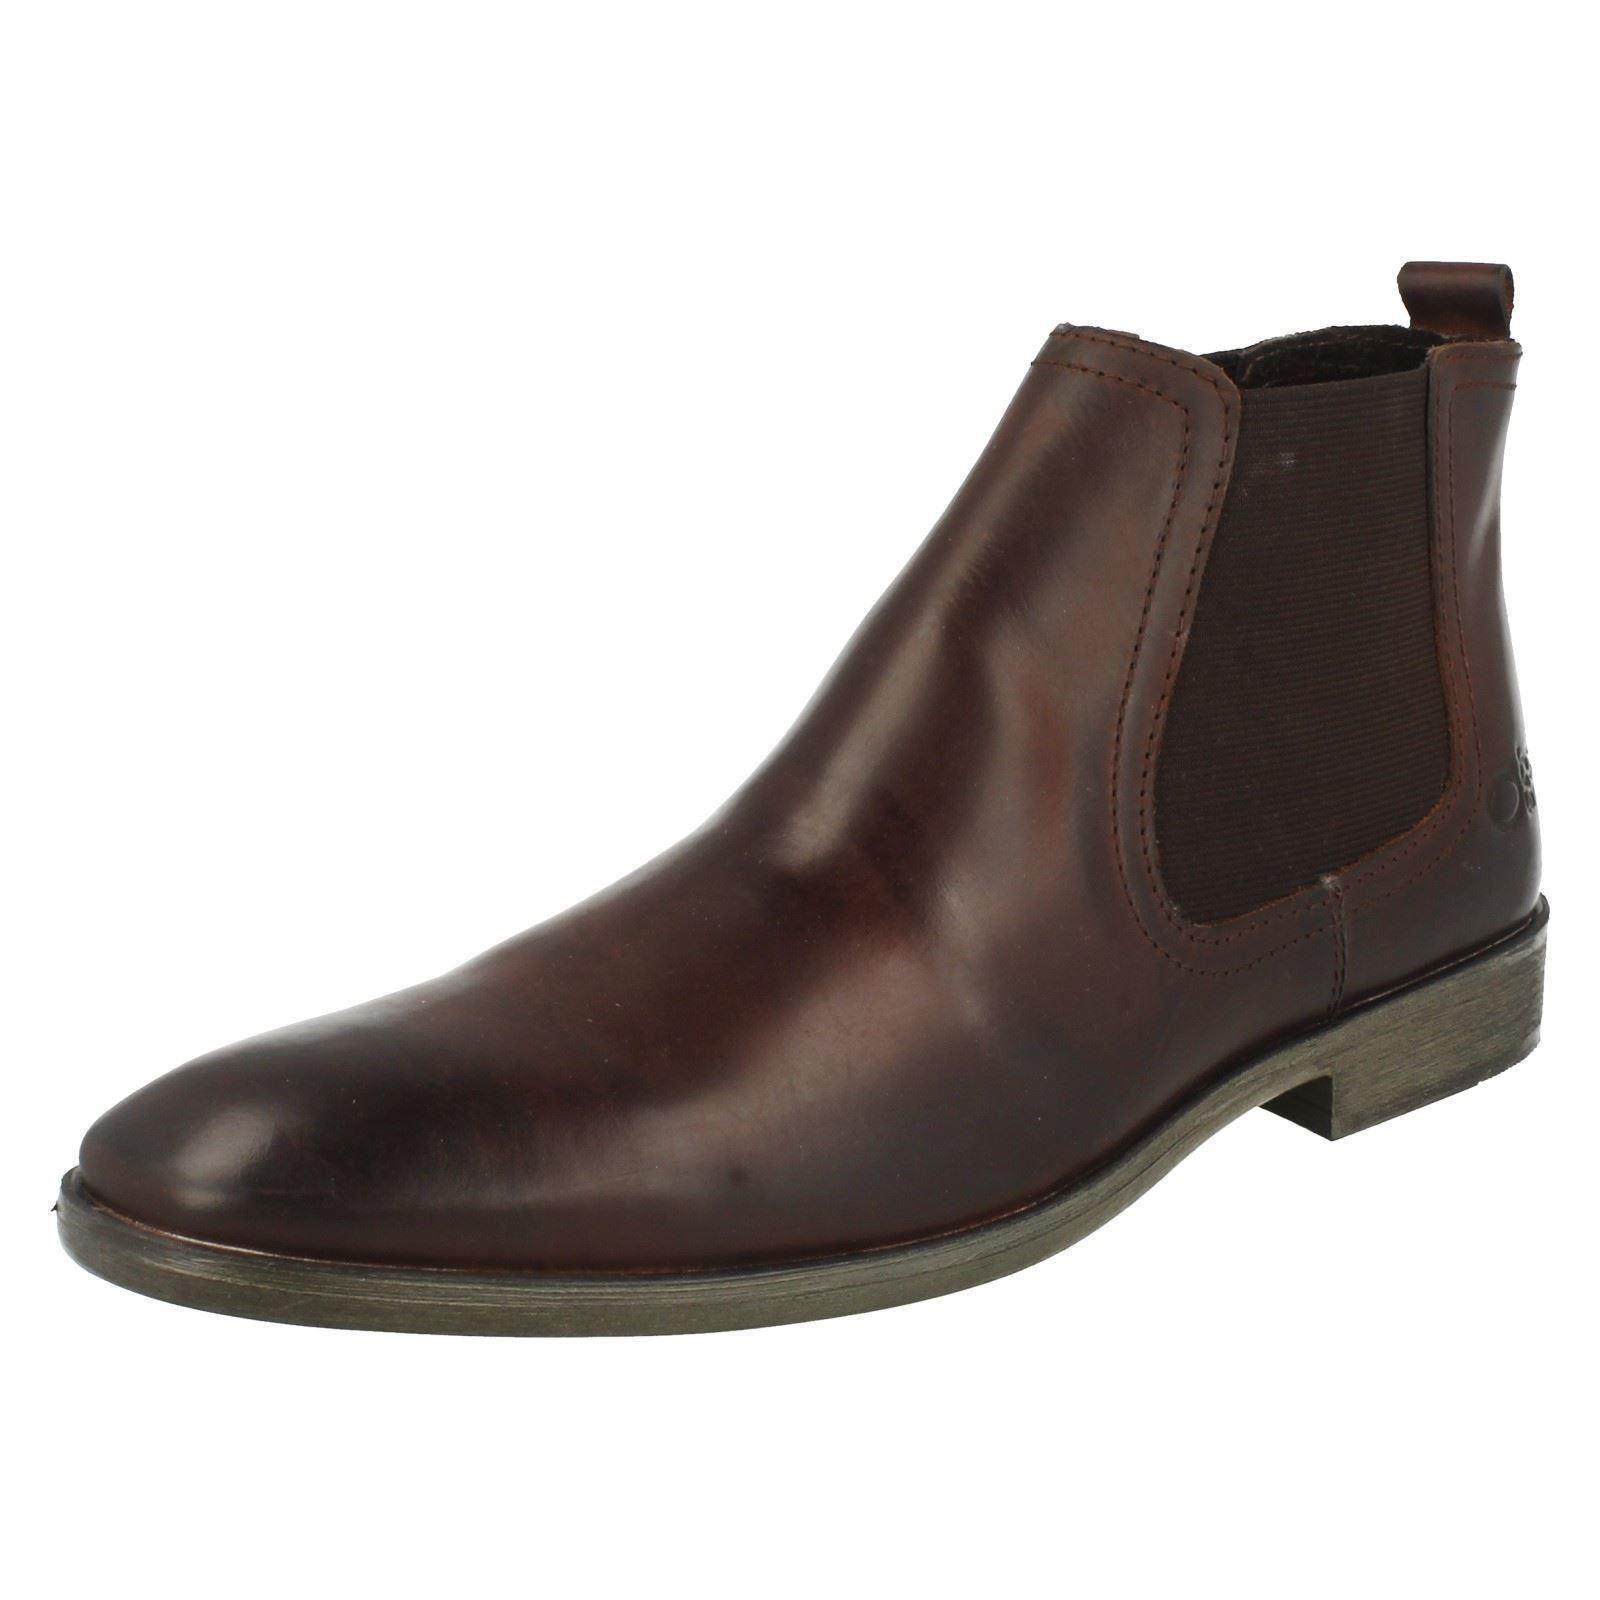 Mens Base London Pull On Chelsea Boots 'Saffron'